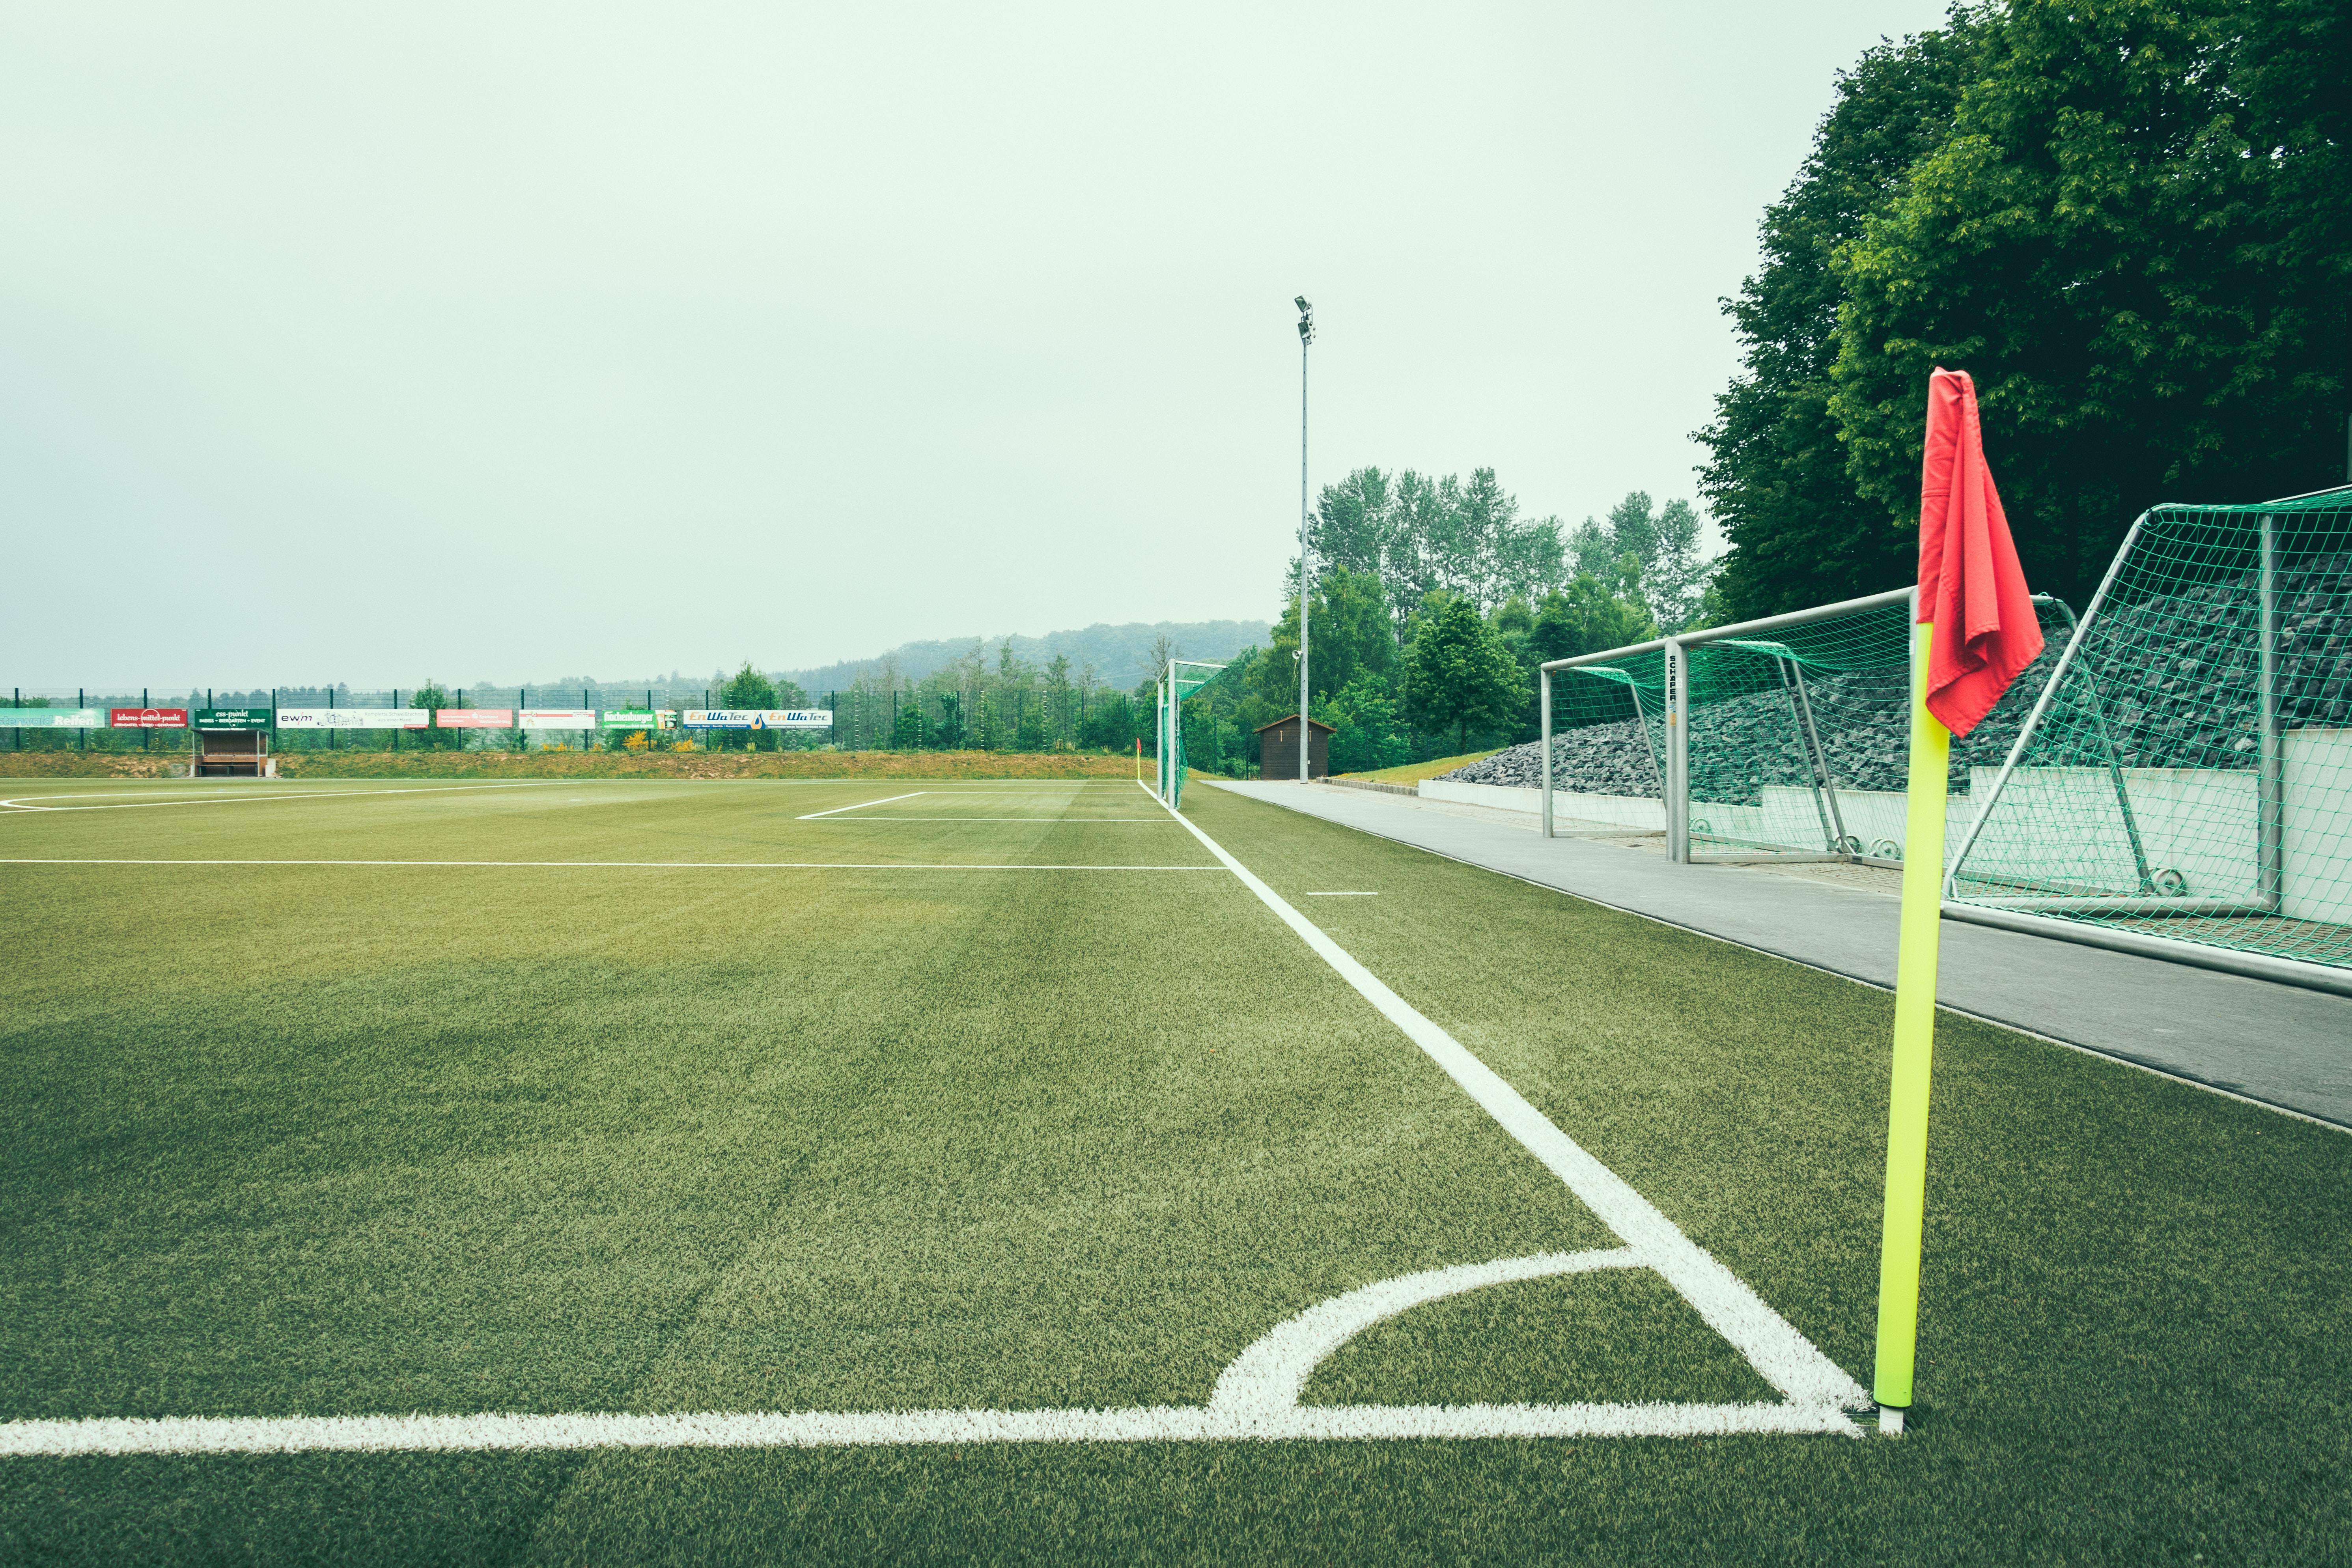 minimalist photo of soccer field